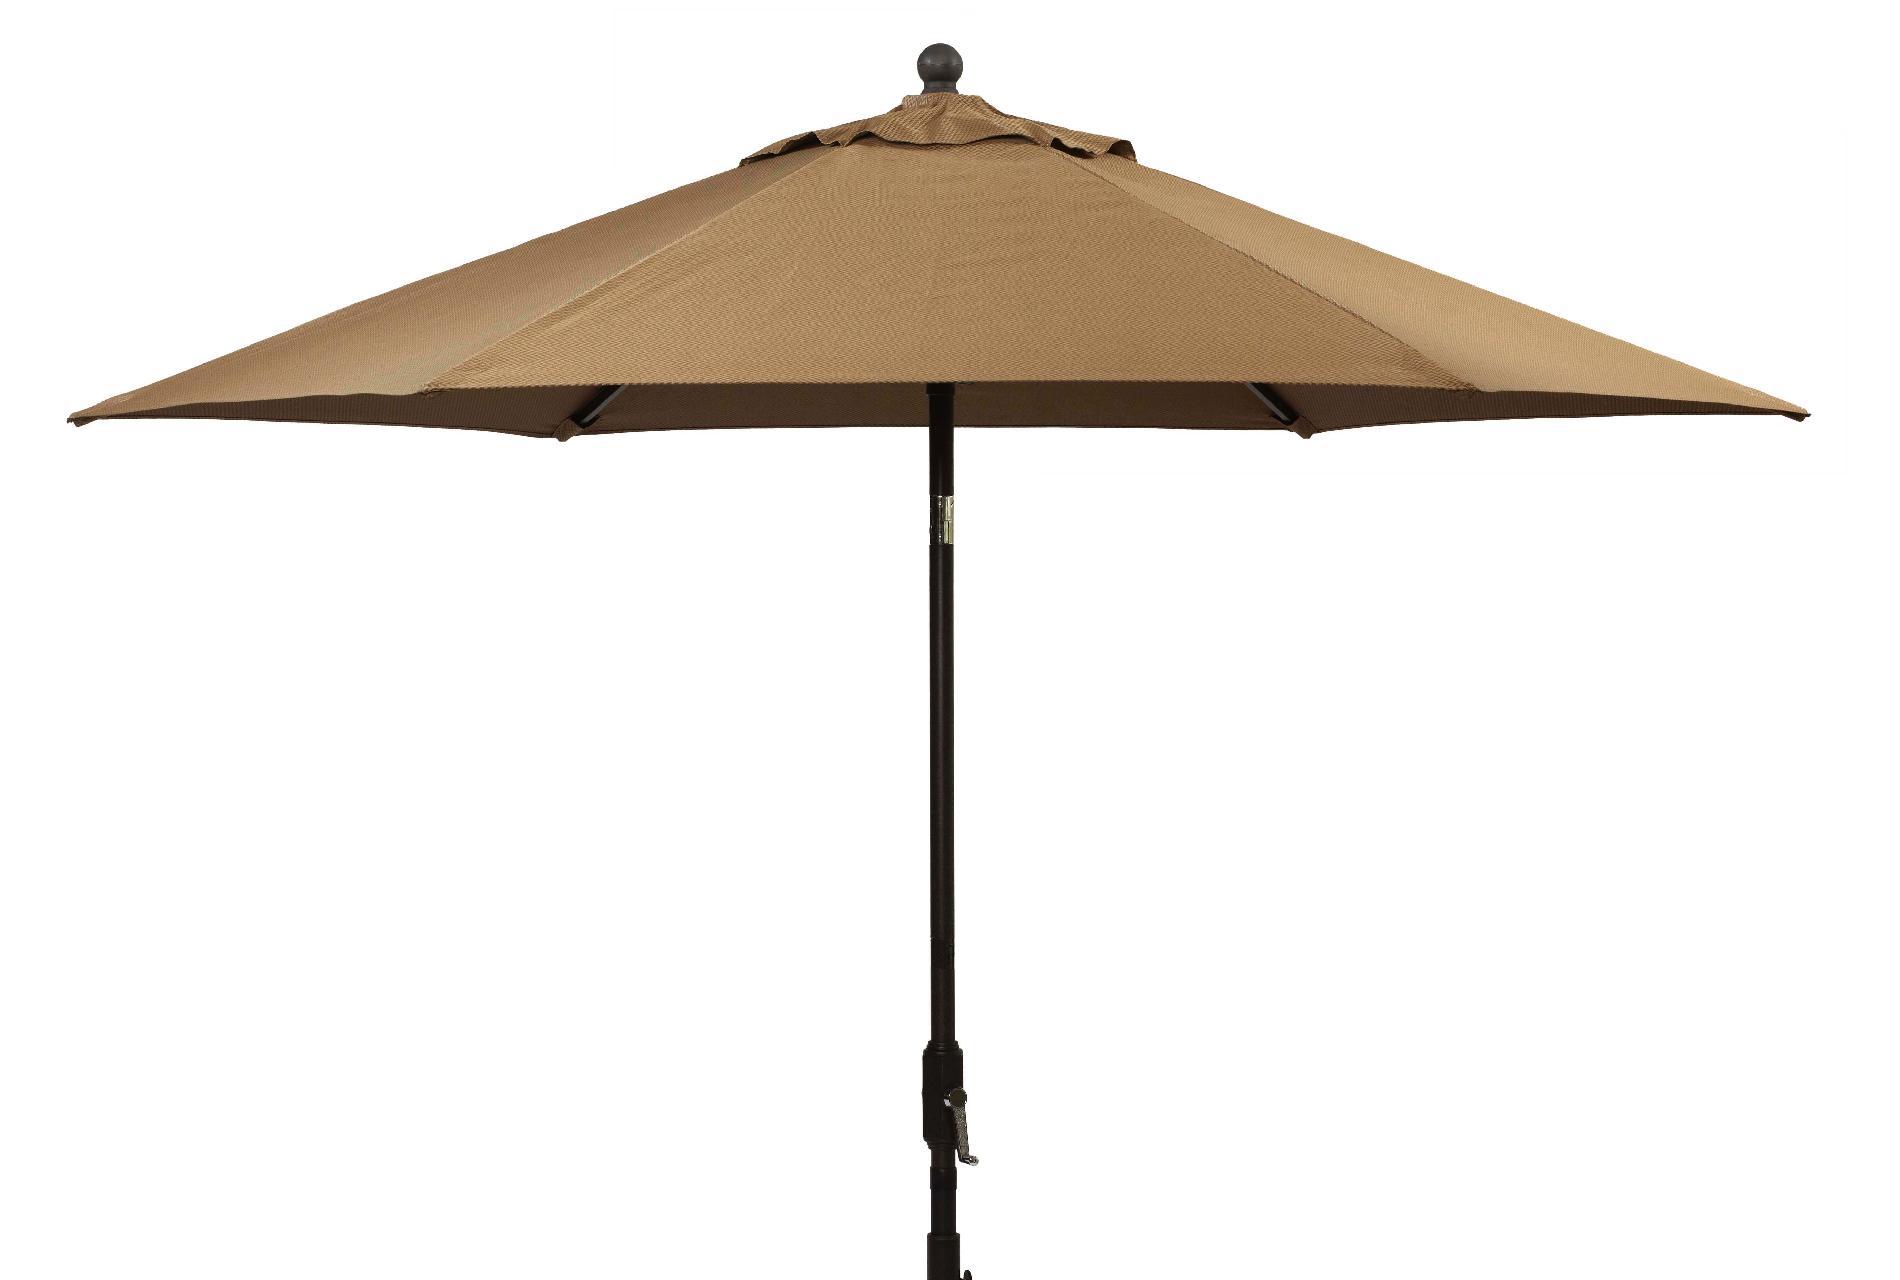 outdoor umbrella agio international arcadia umbrella - sears SWDEVLS